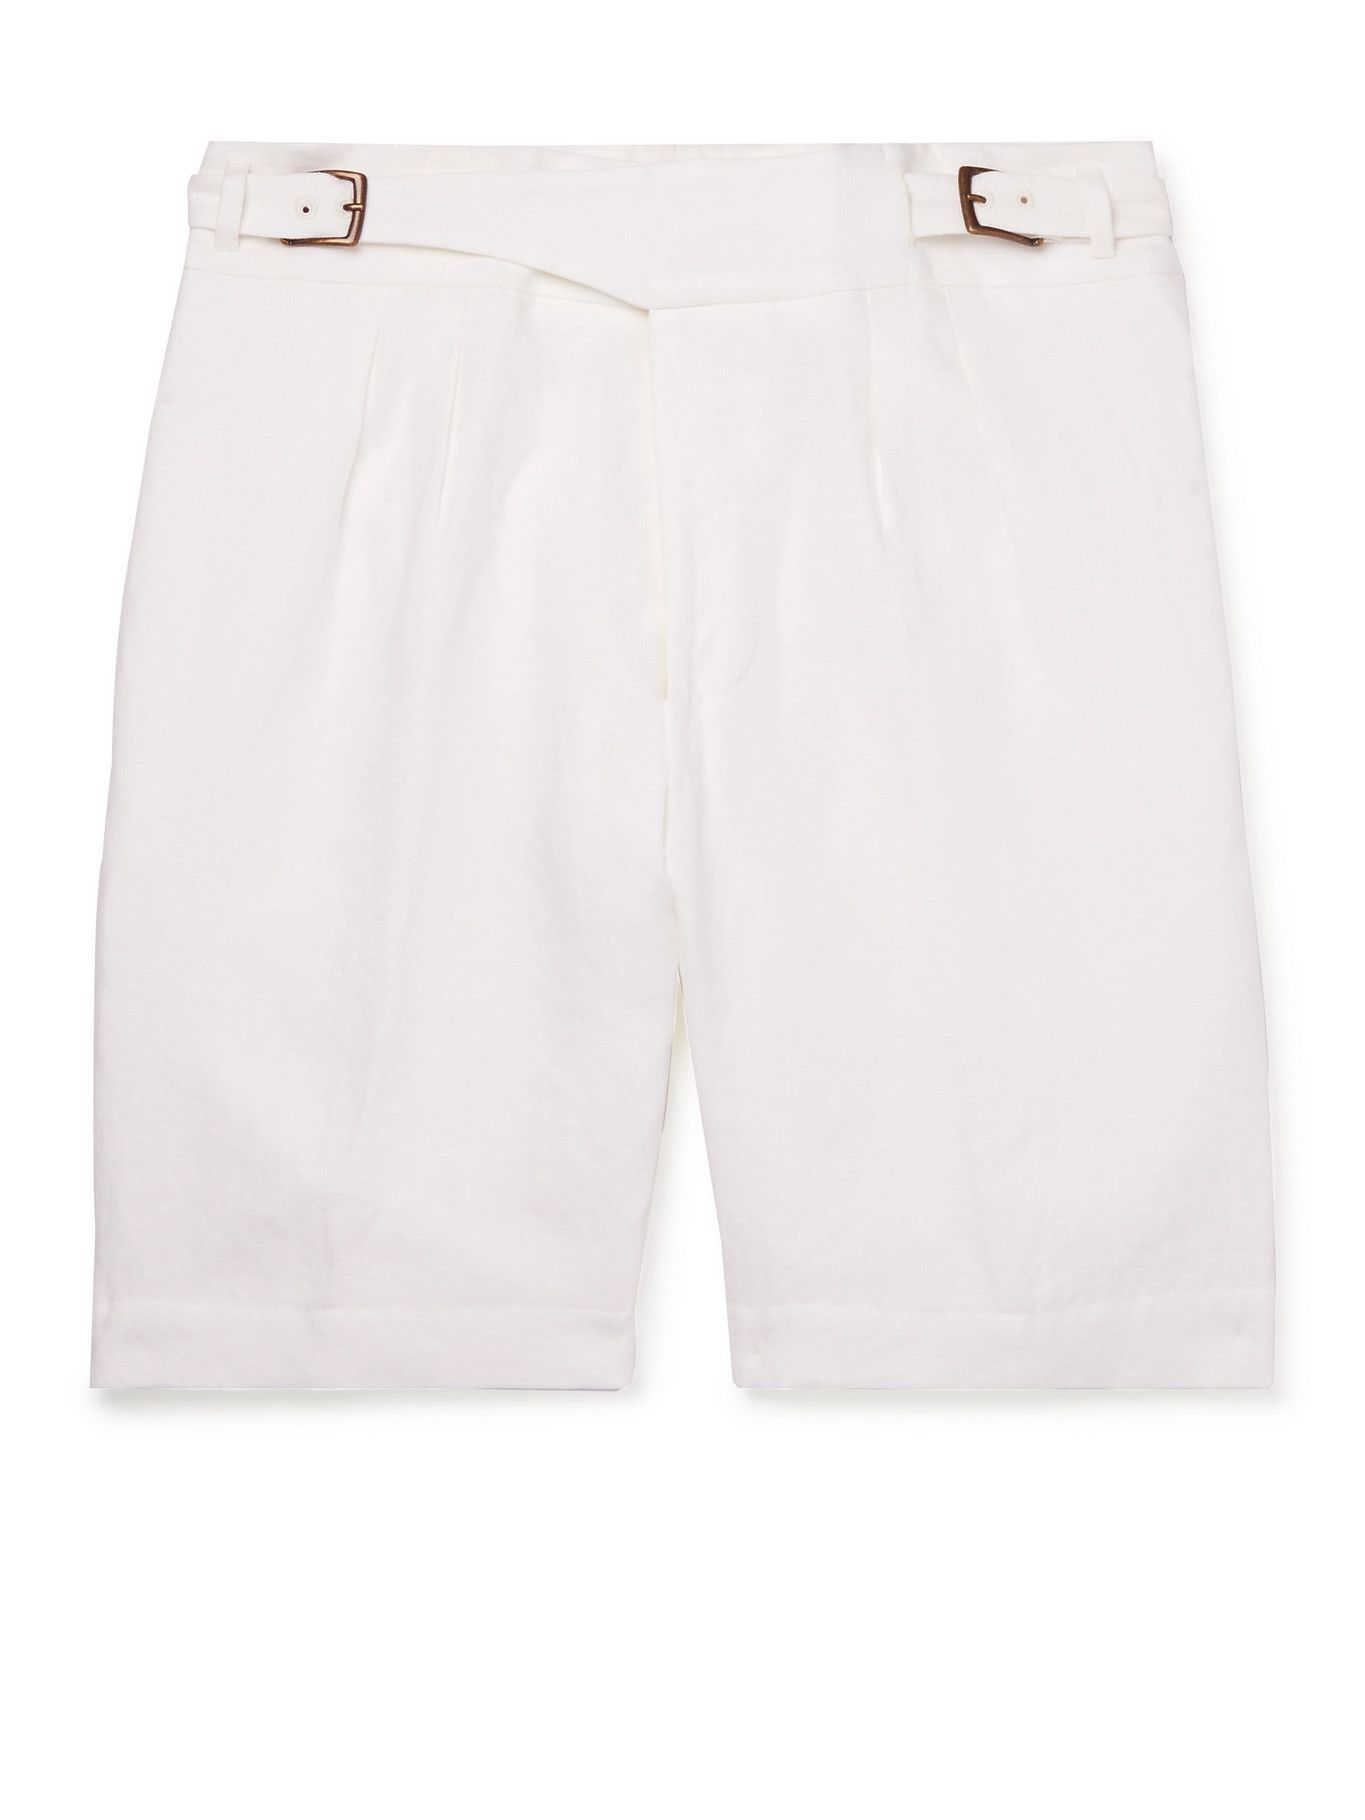 Photo: ANDERSON & SHEPPARD - Gurkha Pleated Linen Shorts - Neutrals